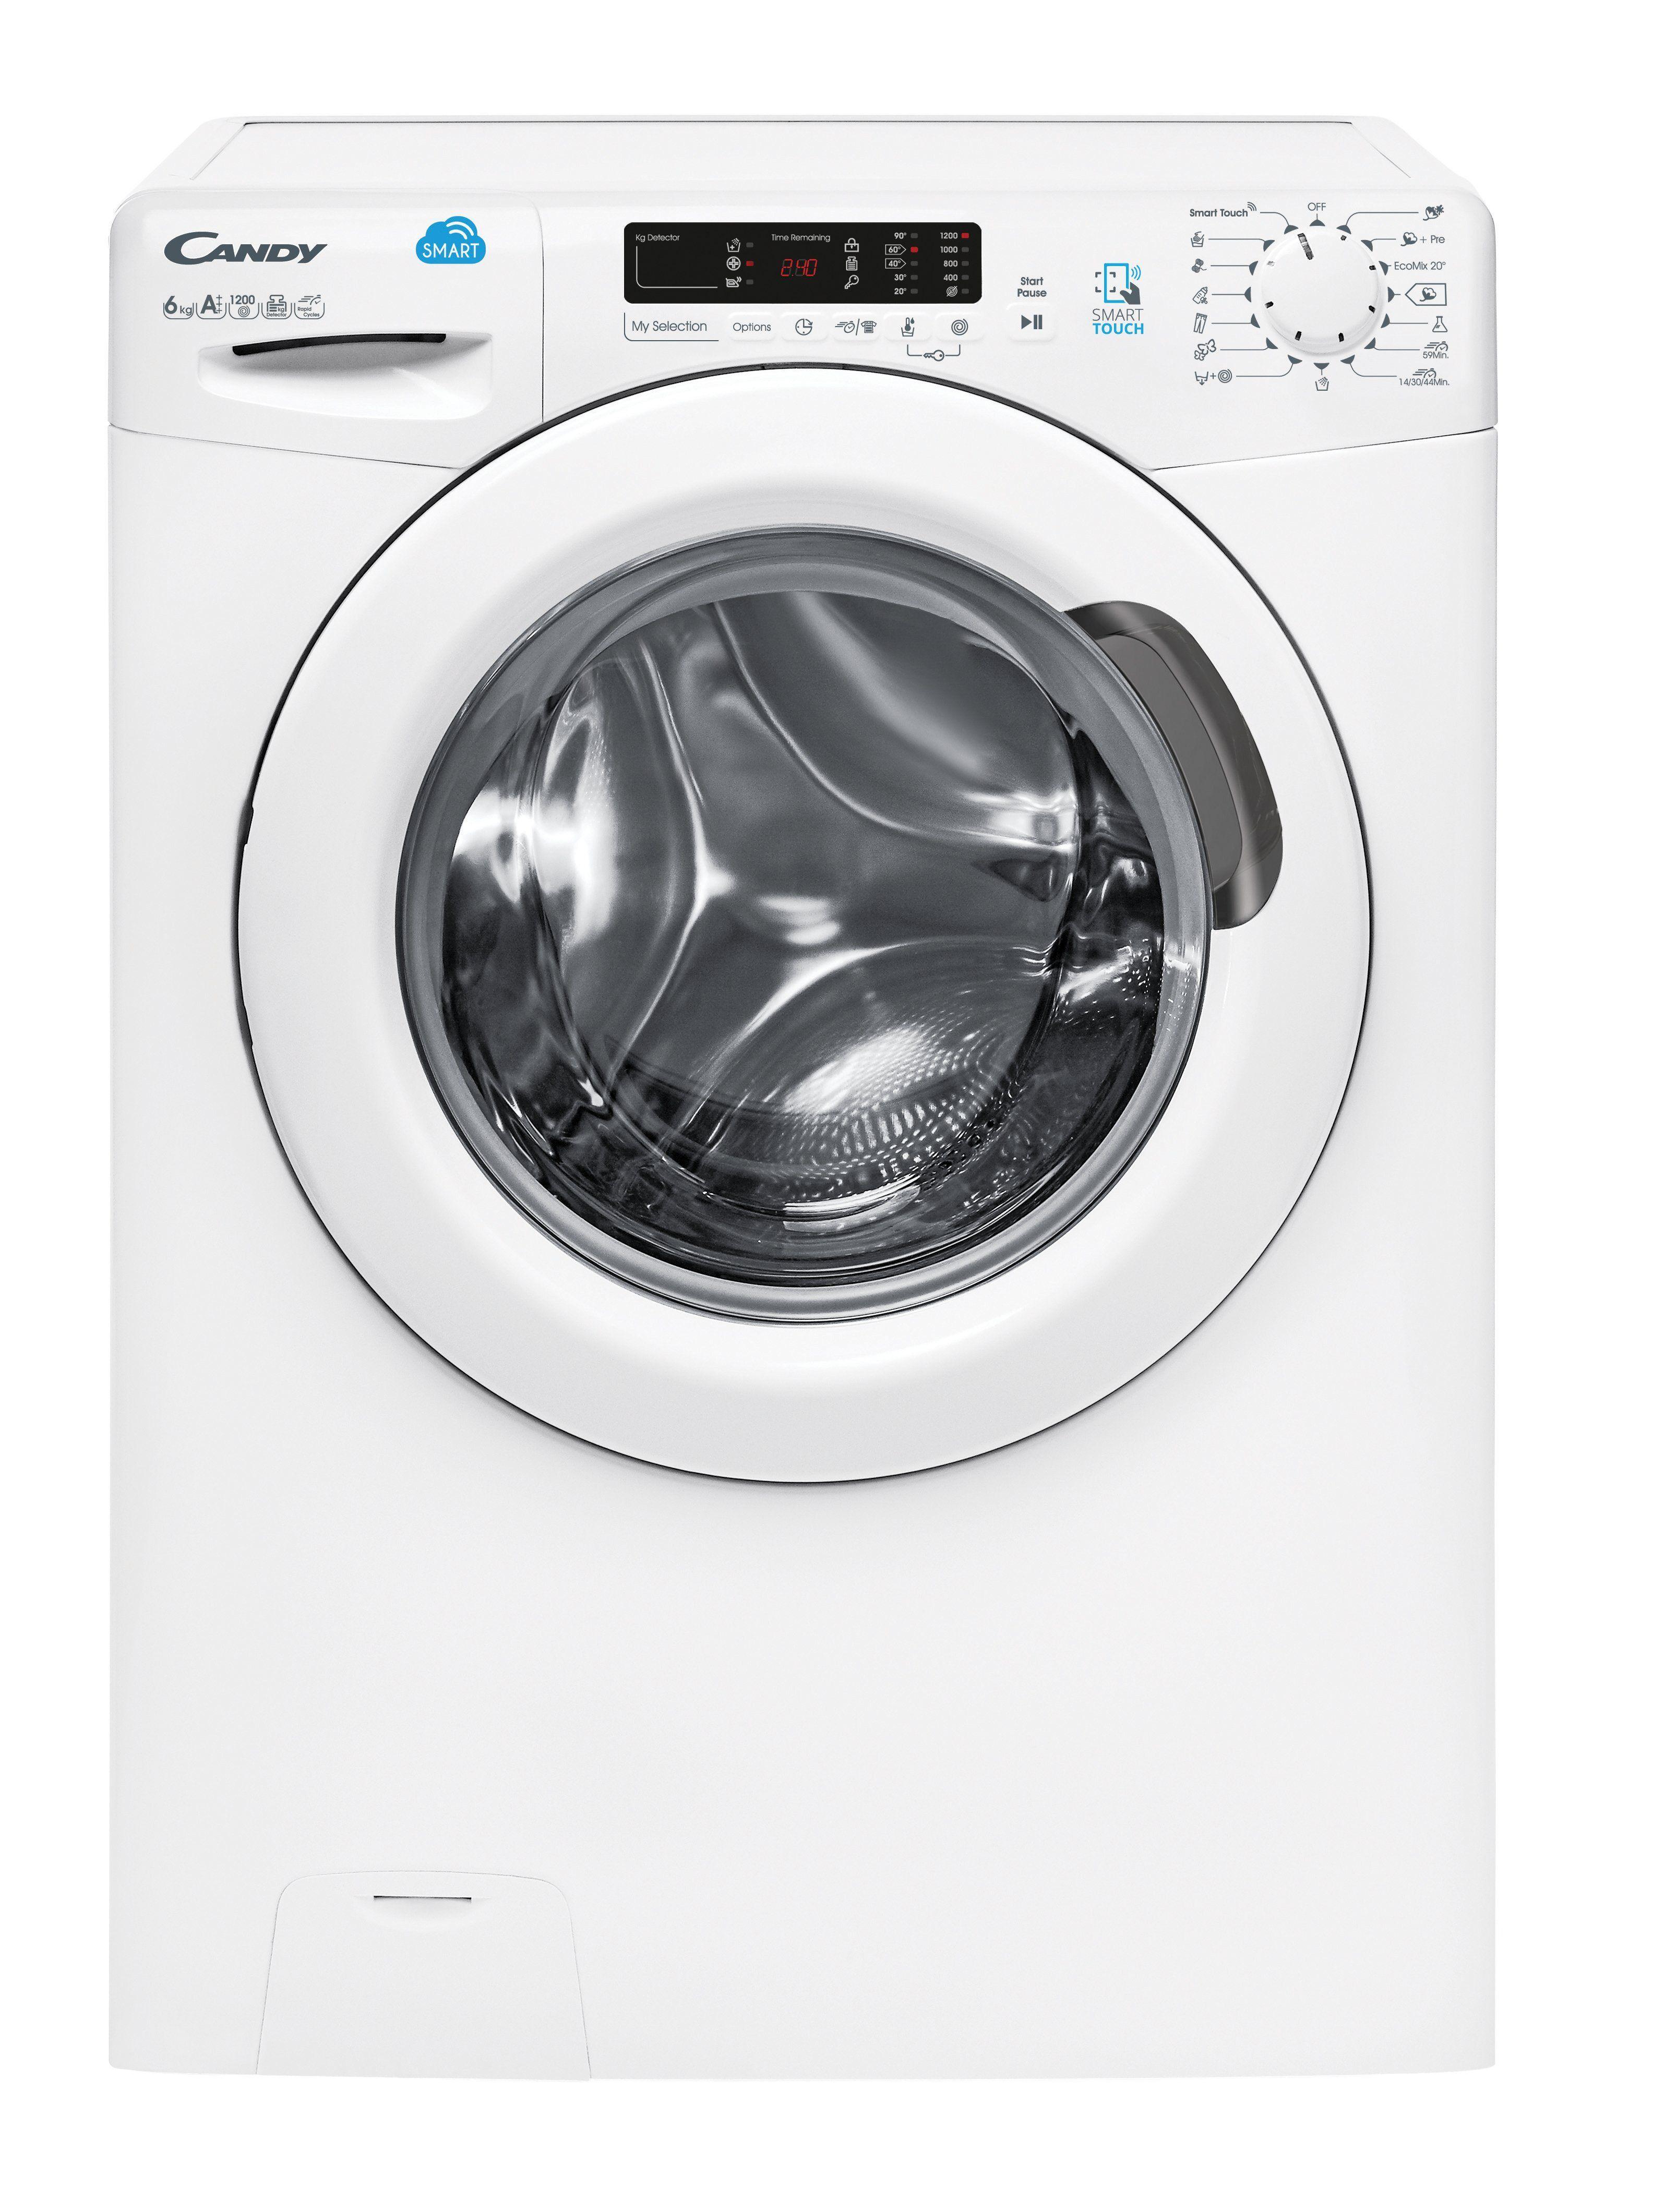 Candy Waschmaschine CS4 1262D3/1-S, 6 kg, 1200 U/Min,, Energieeffizienzklasse A+++